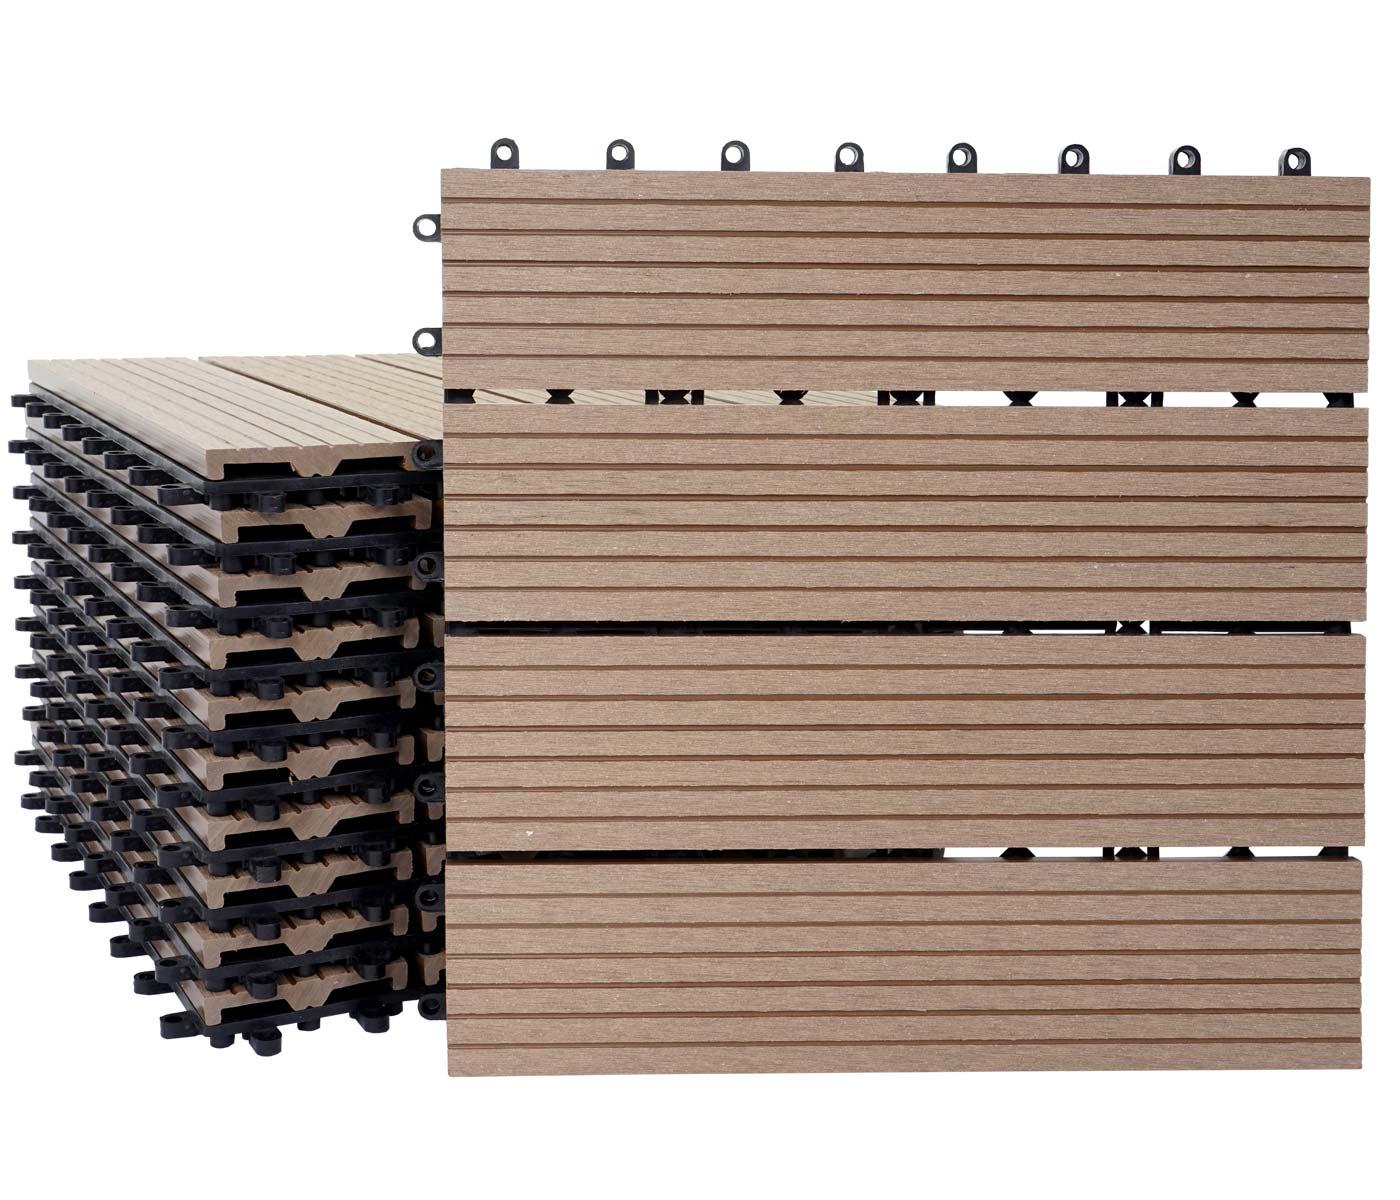 1qm wpc holz fliesen sarthe bodenfliesen balkon terrasse teak linear ebay. Black Bedroom Furniture Sets. Home Design Ideas